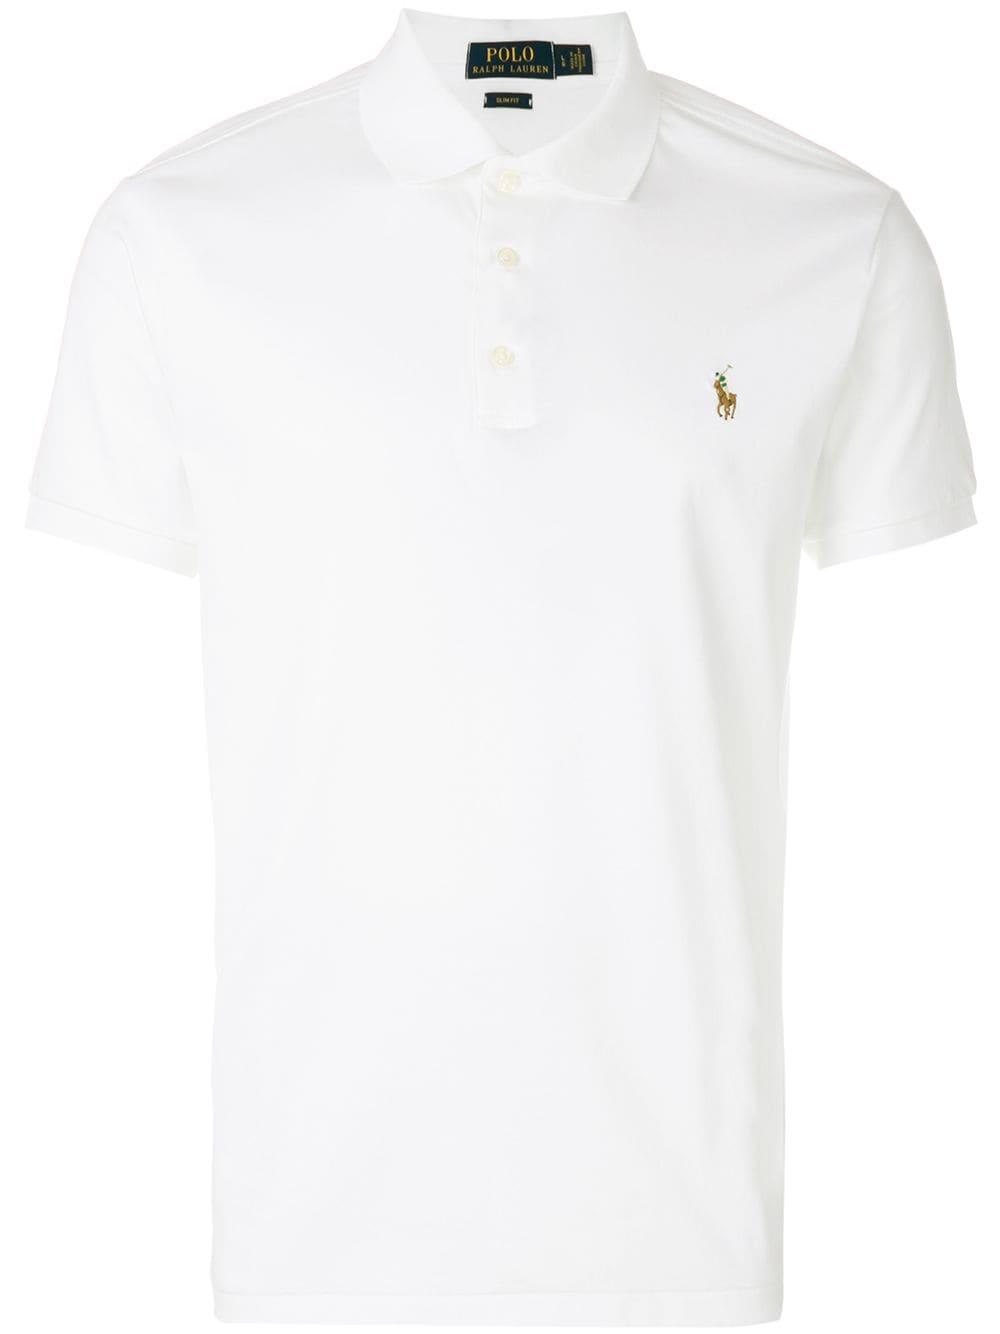 Polo Ralph Lauren Poloshirt mit aufgesticktem Logo - Weiß